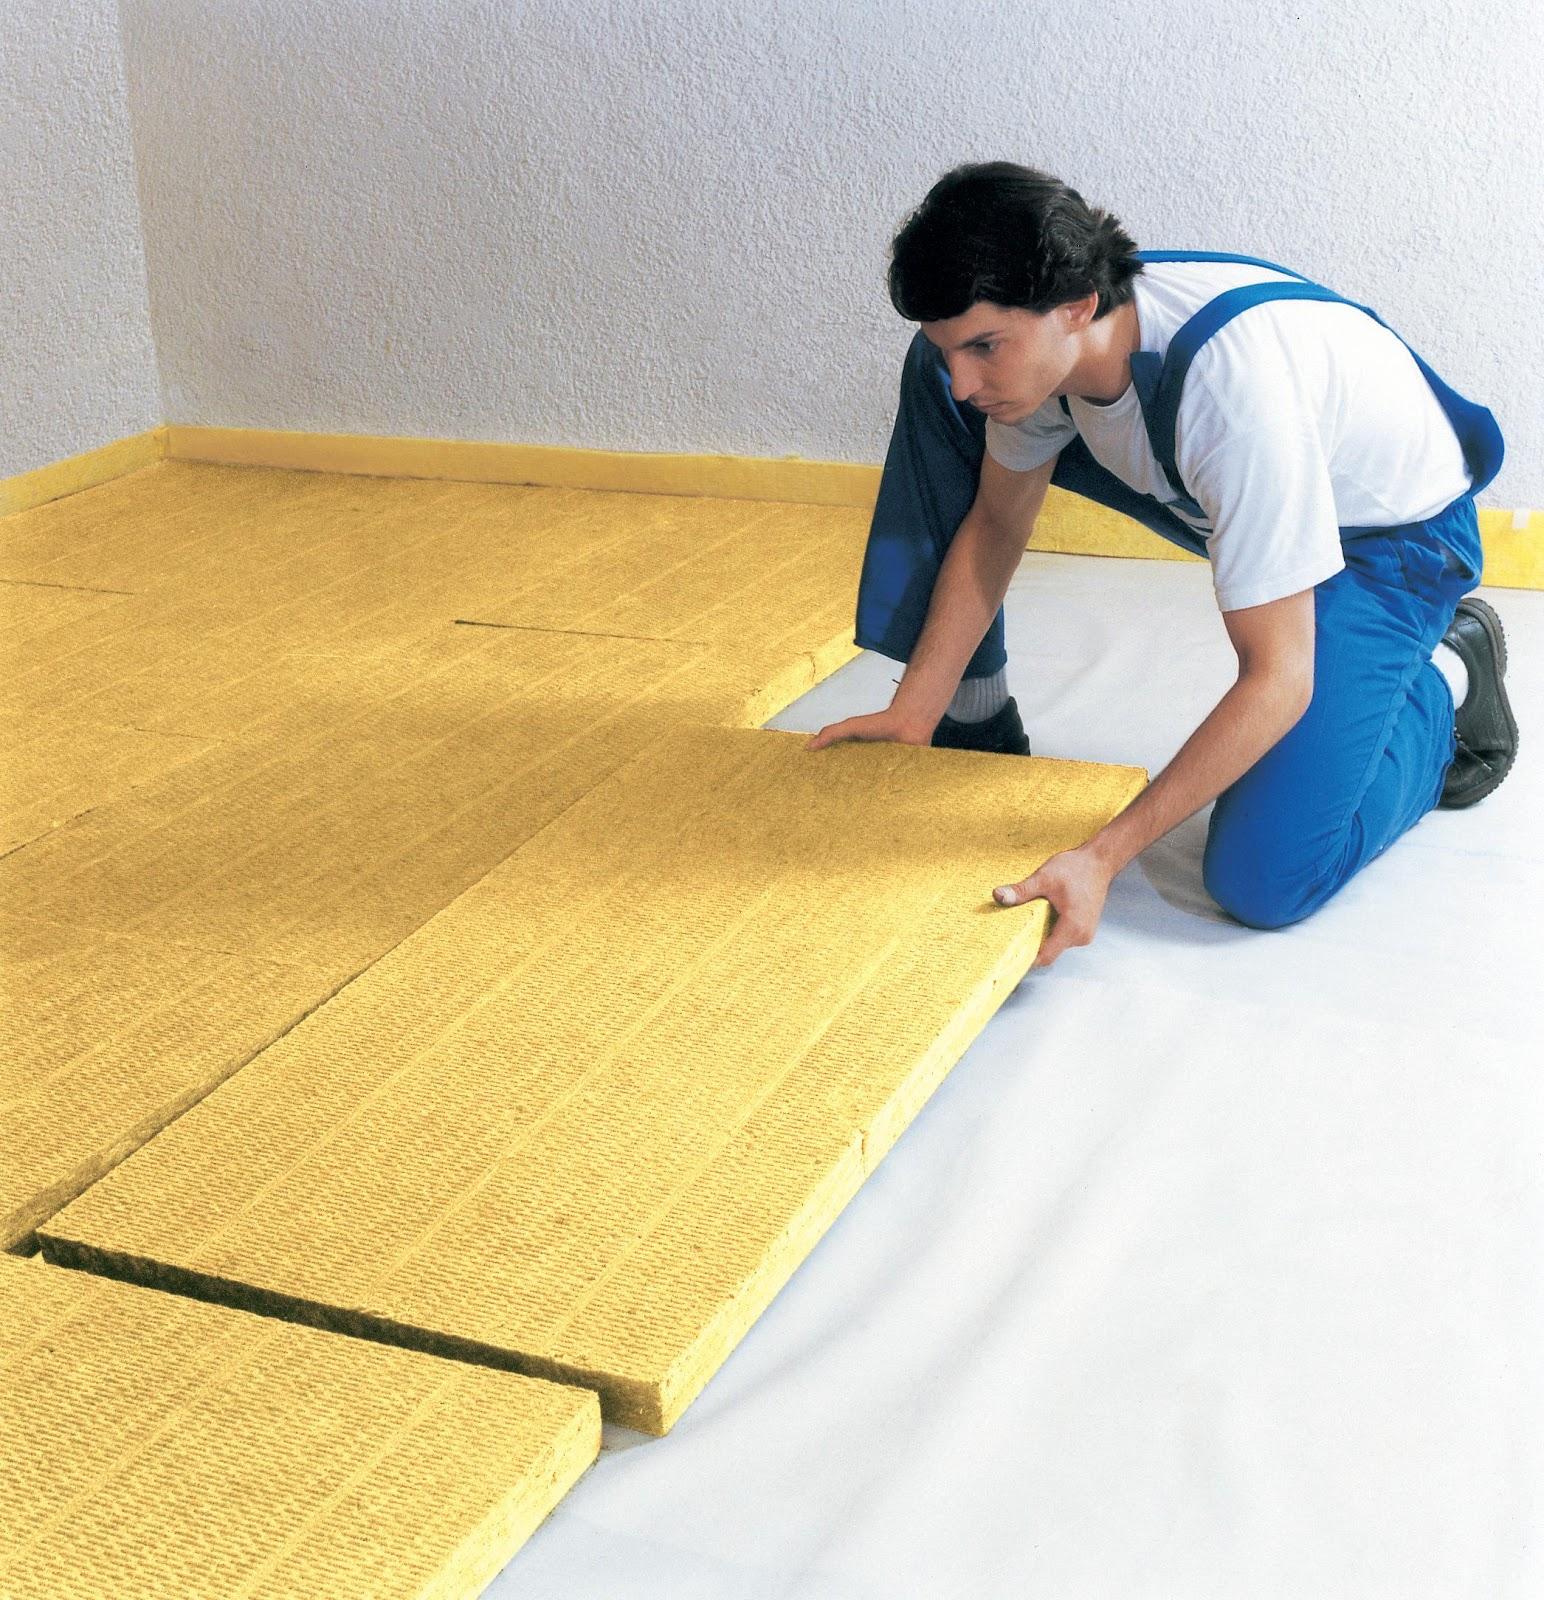 http://kettyle.com/wp-content/uploads/2013/01/Floor-insulation.jpg